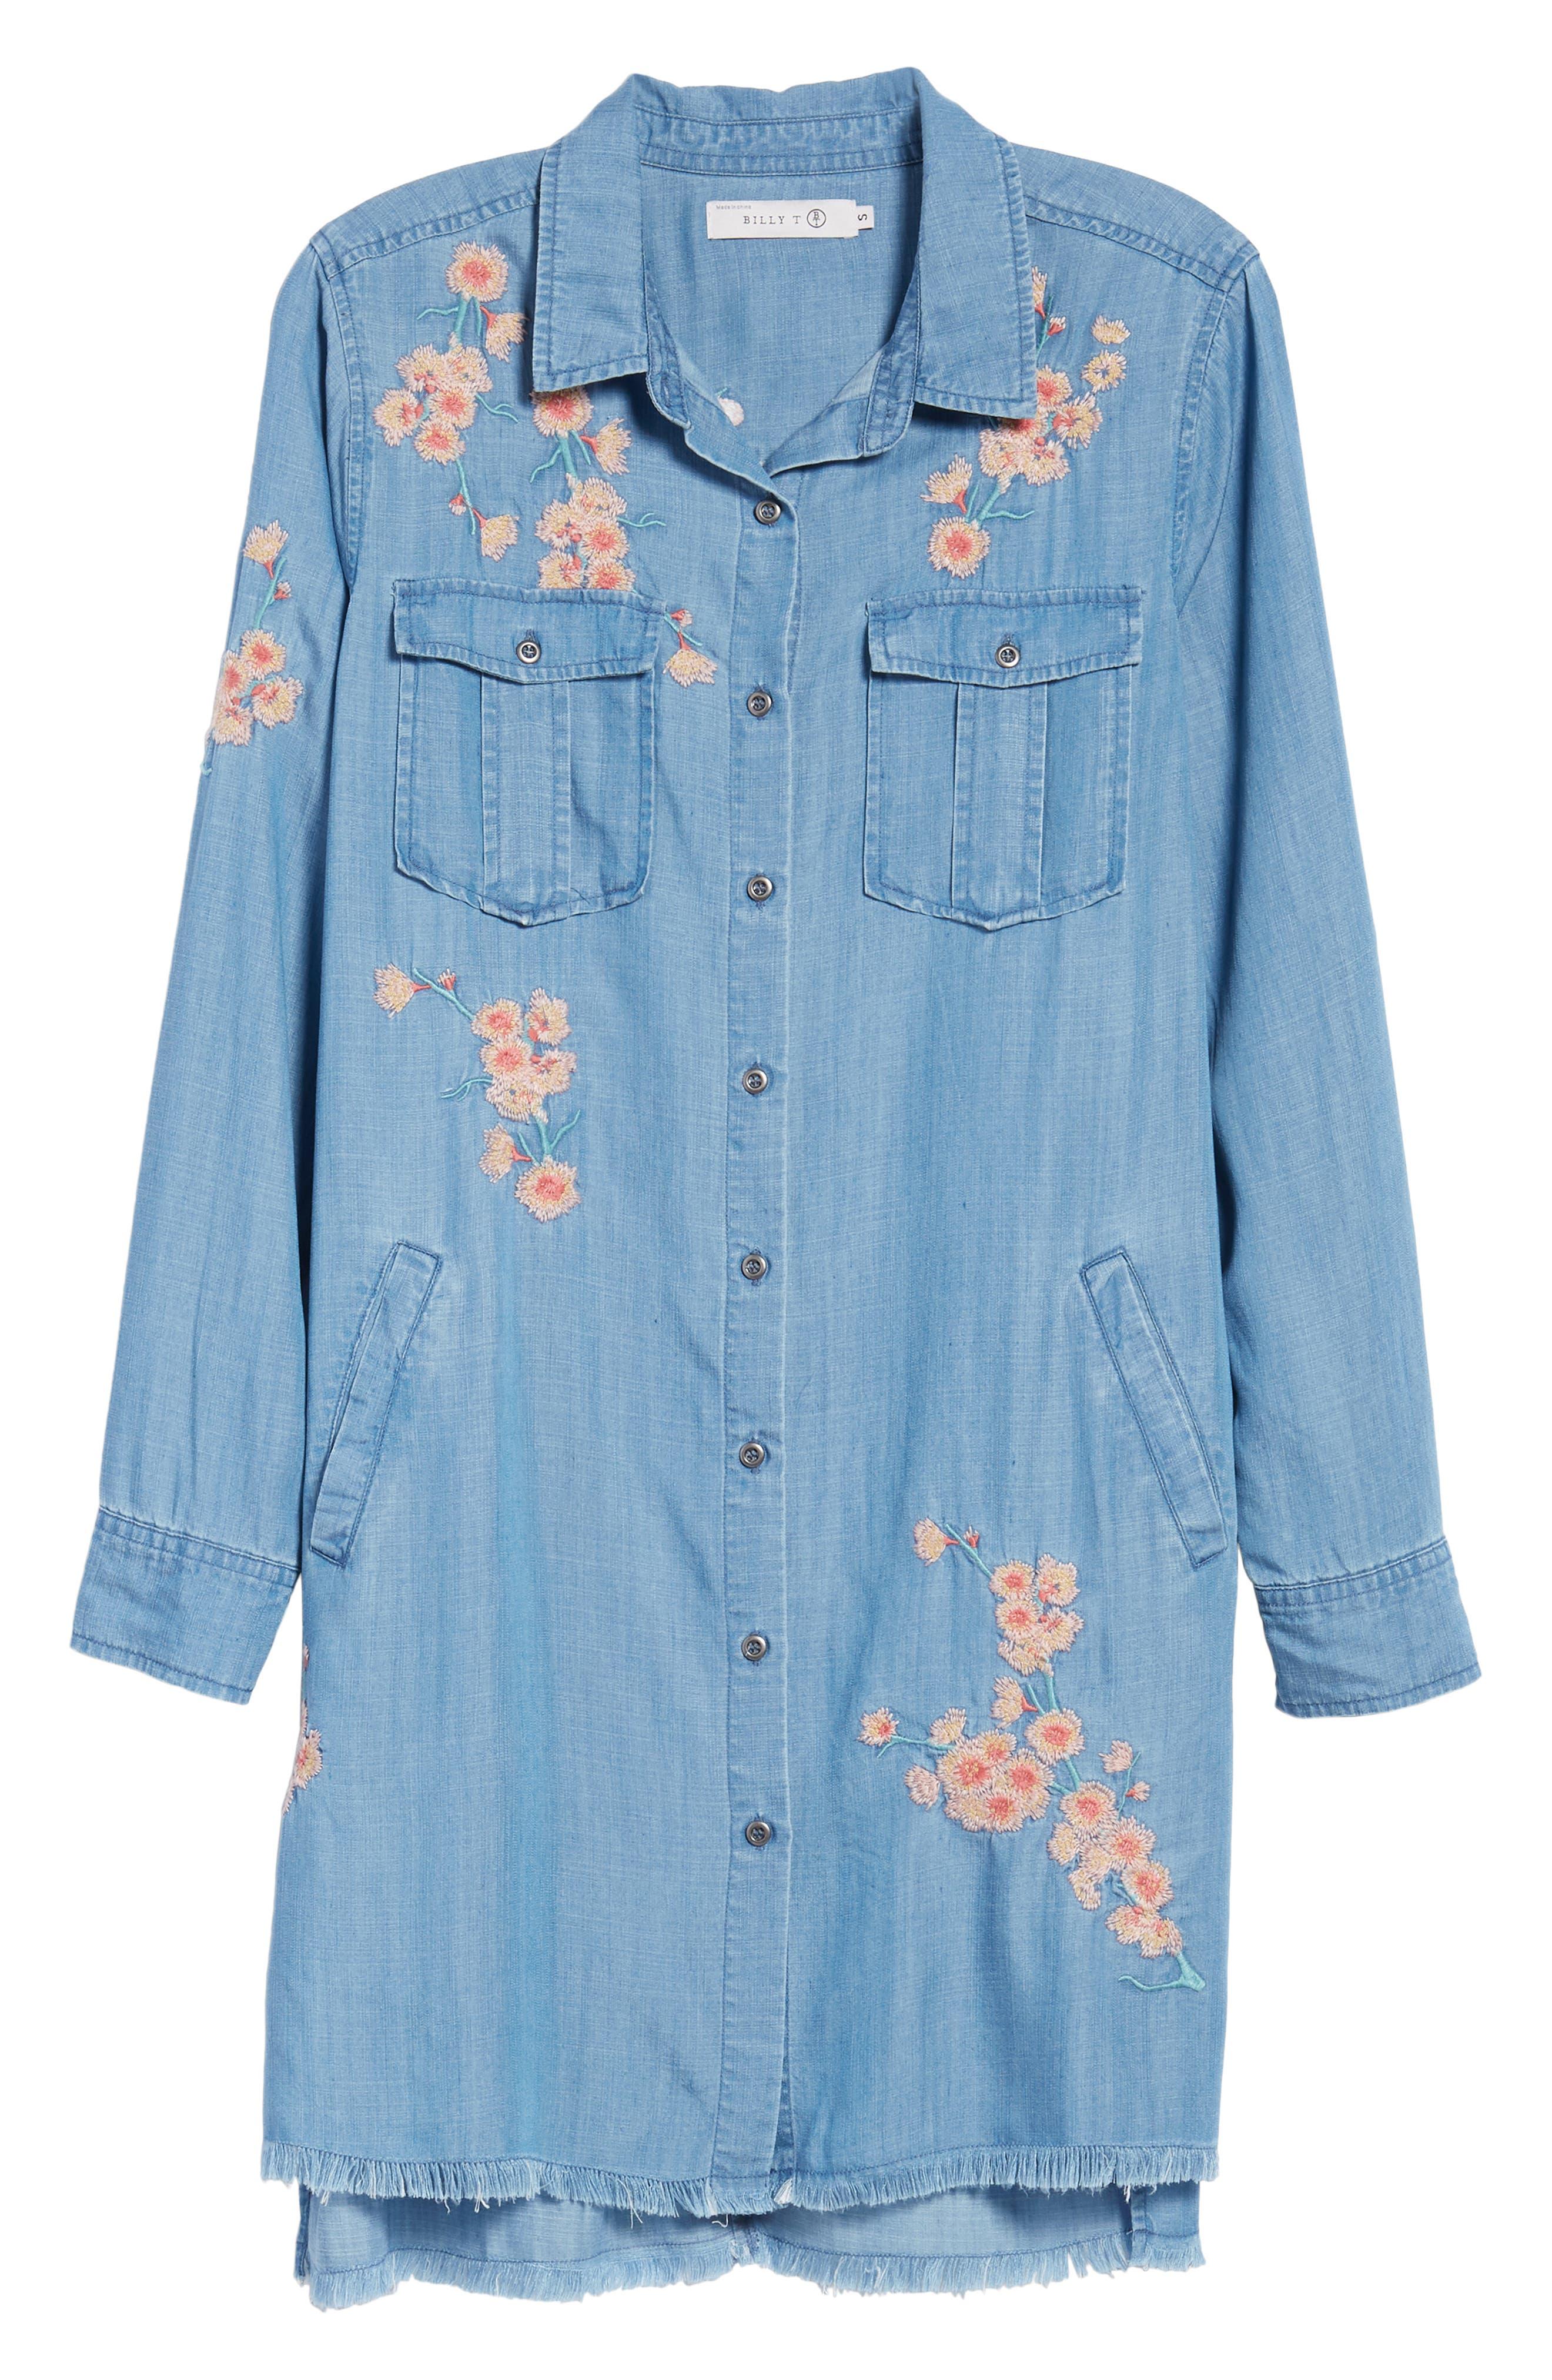 Cherry Blossom Shirtdress,                             Alternate thumbnail 7, color,                             Blue Emb